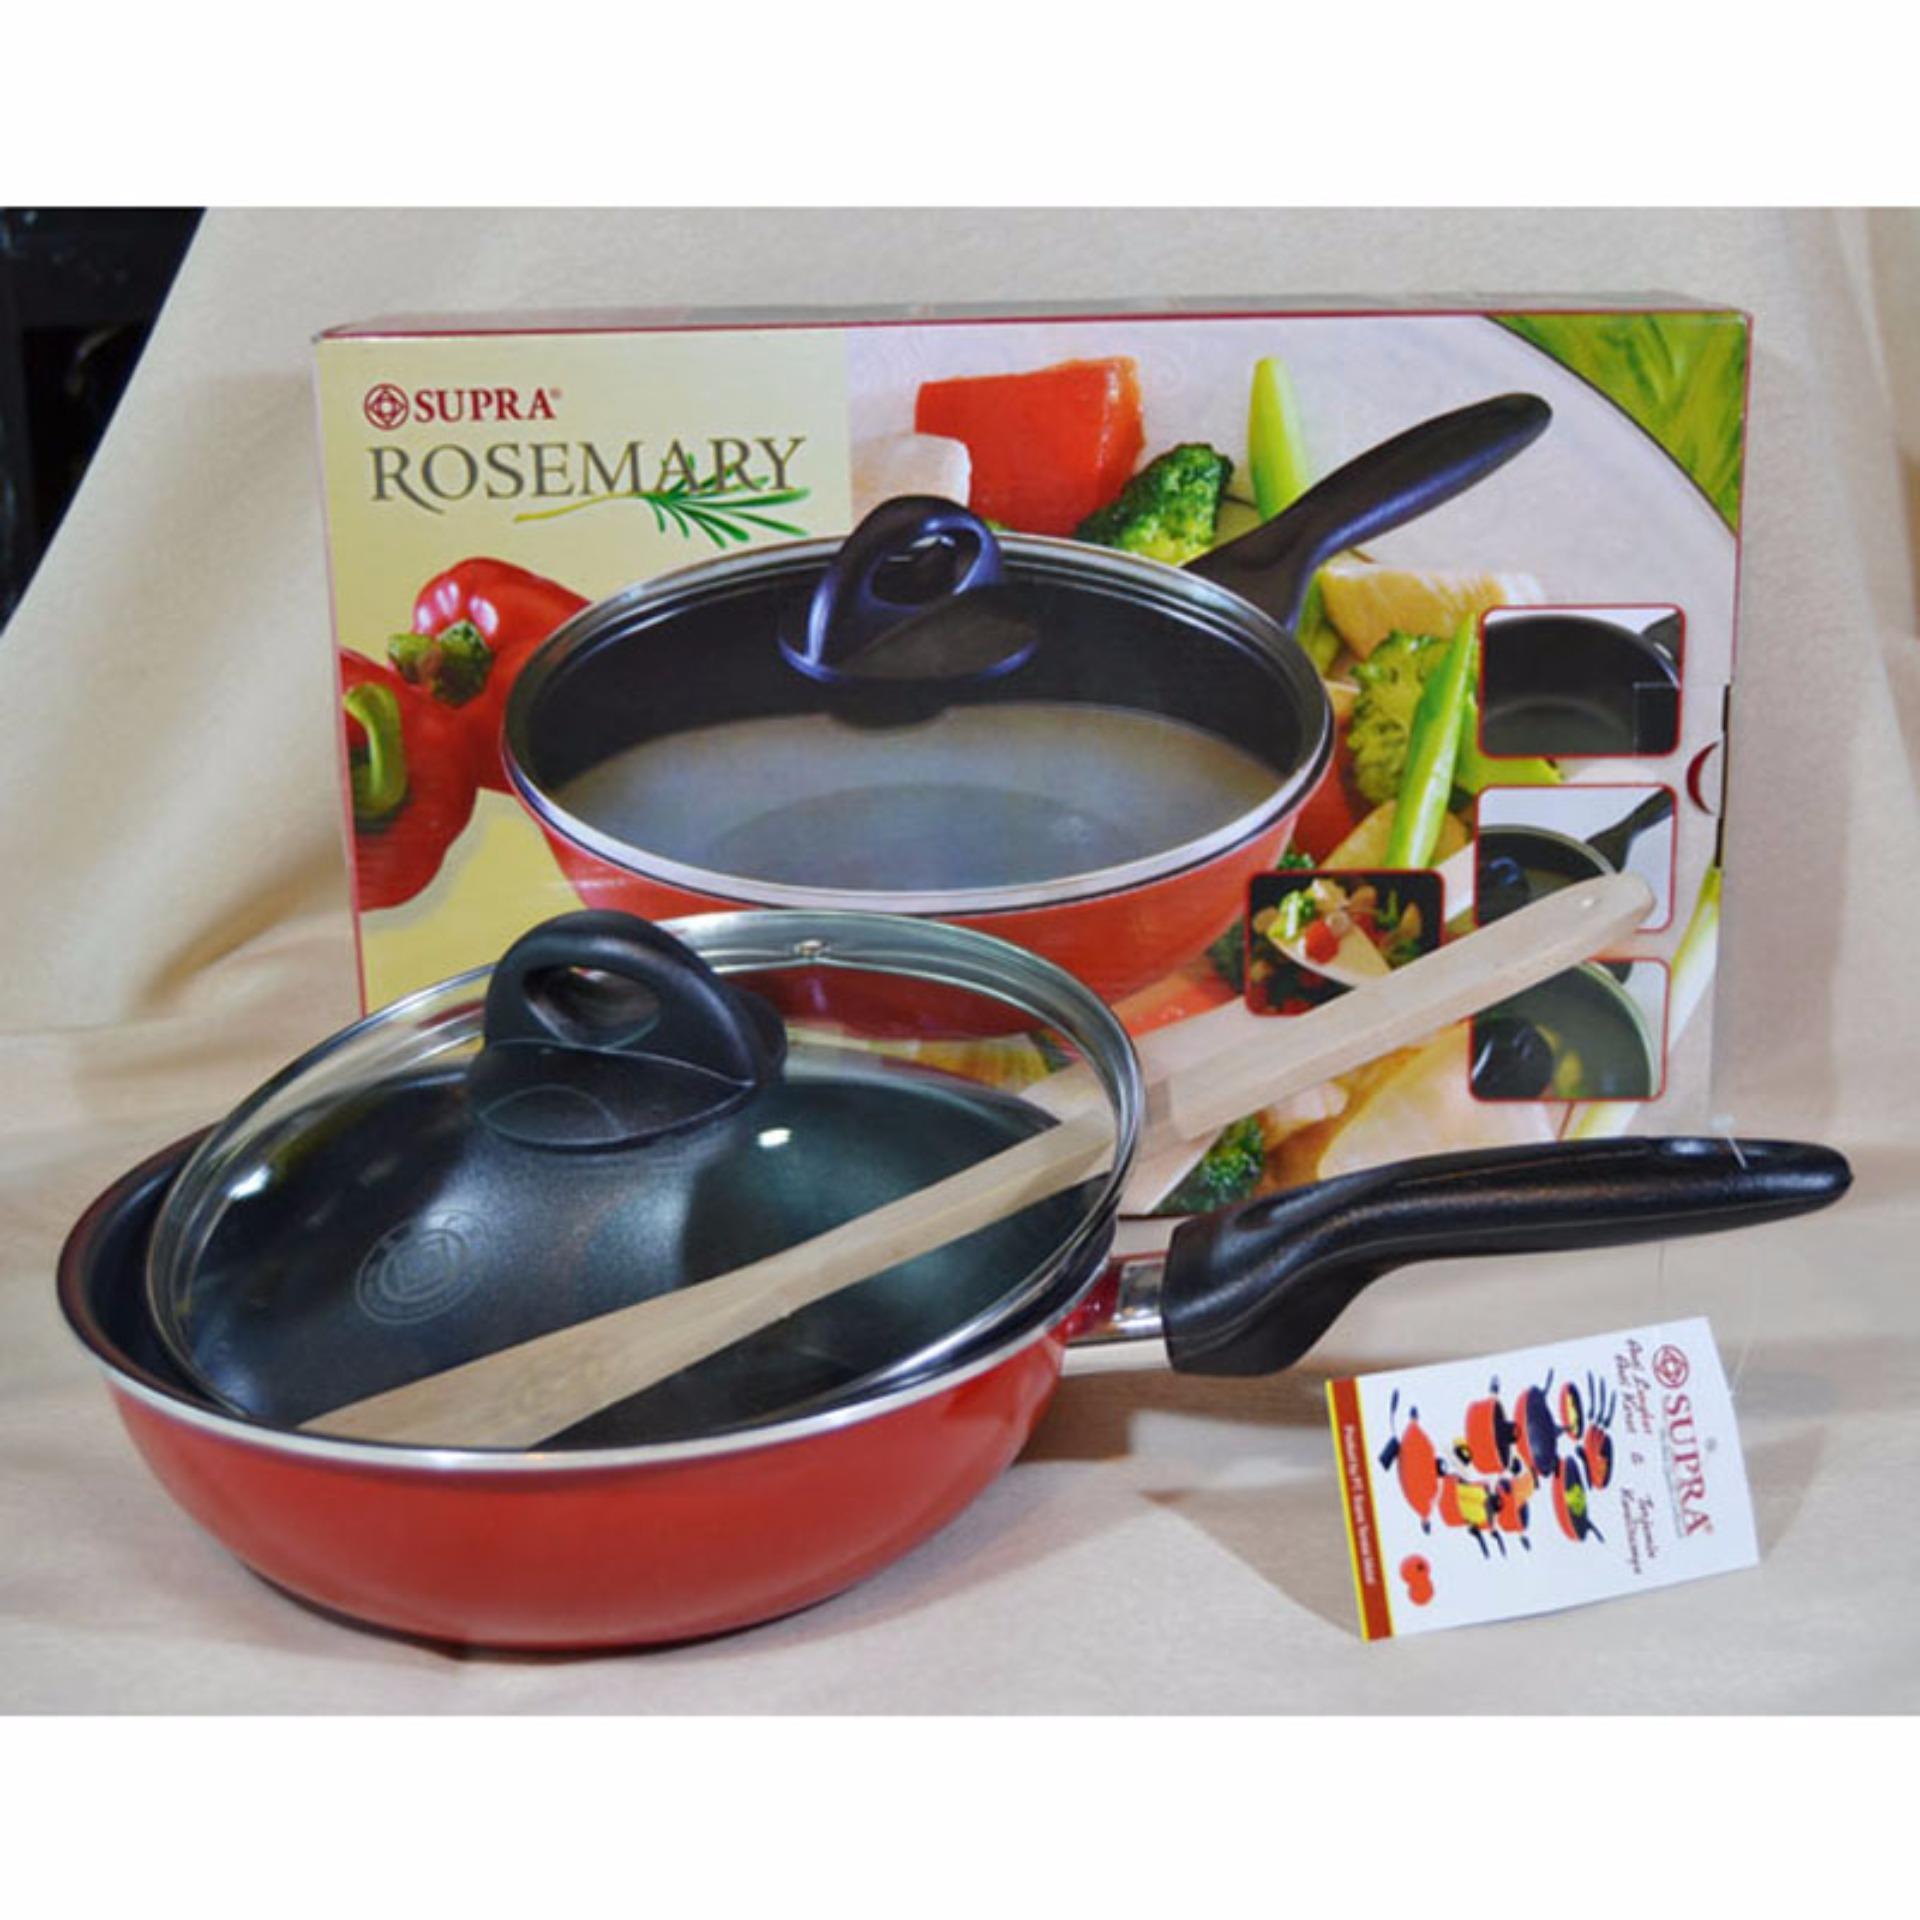 Situs Review Supra Rosemary Non Stick Stir Pan Lid Spatula 22 Cm